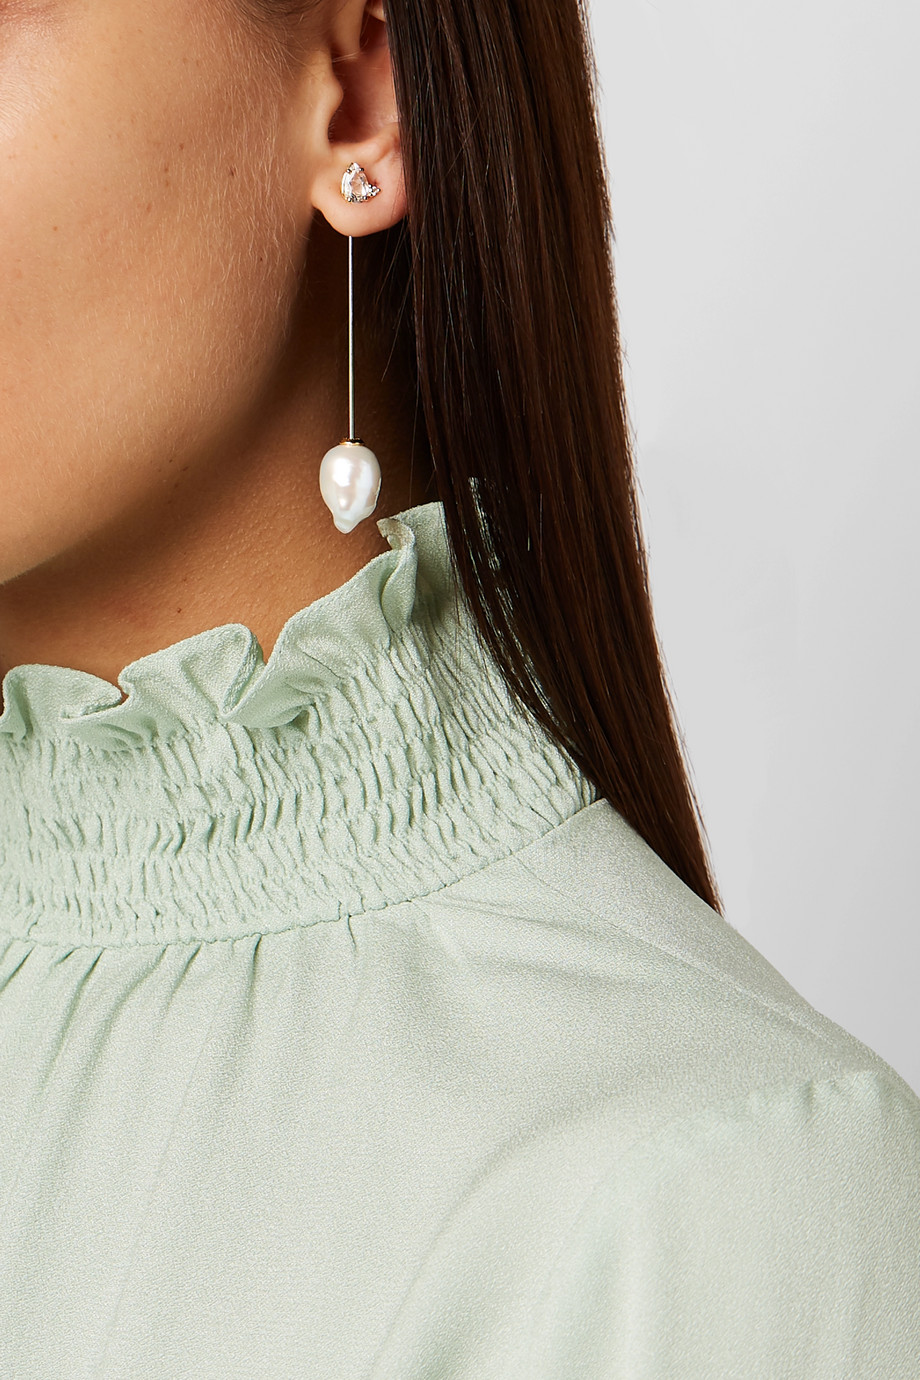 Mizuki 14-karat gold multi-stone earrings